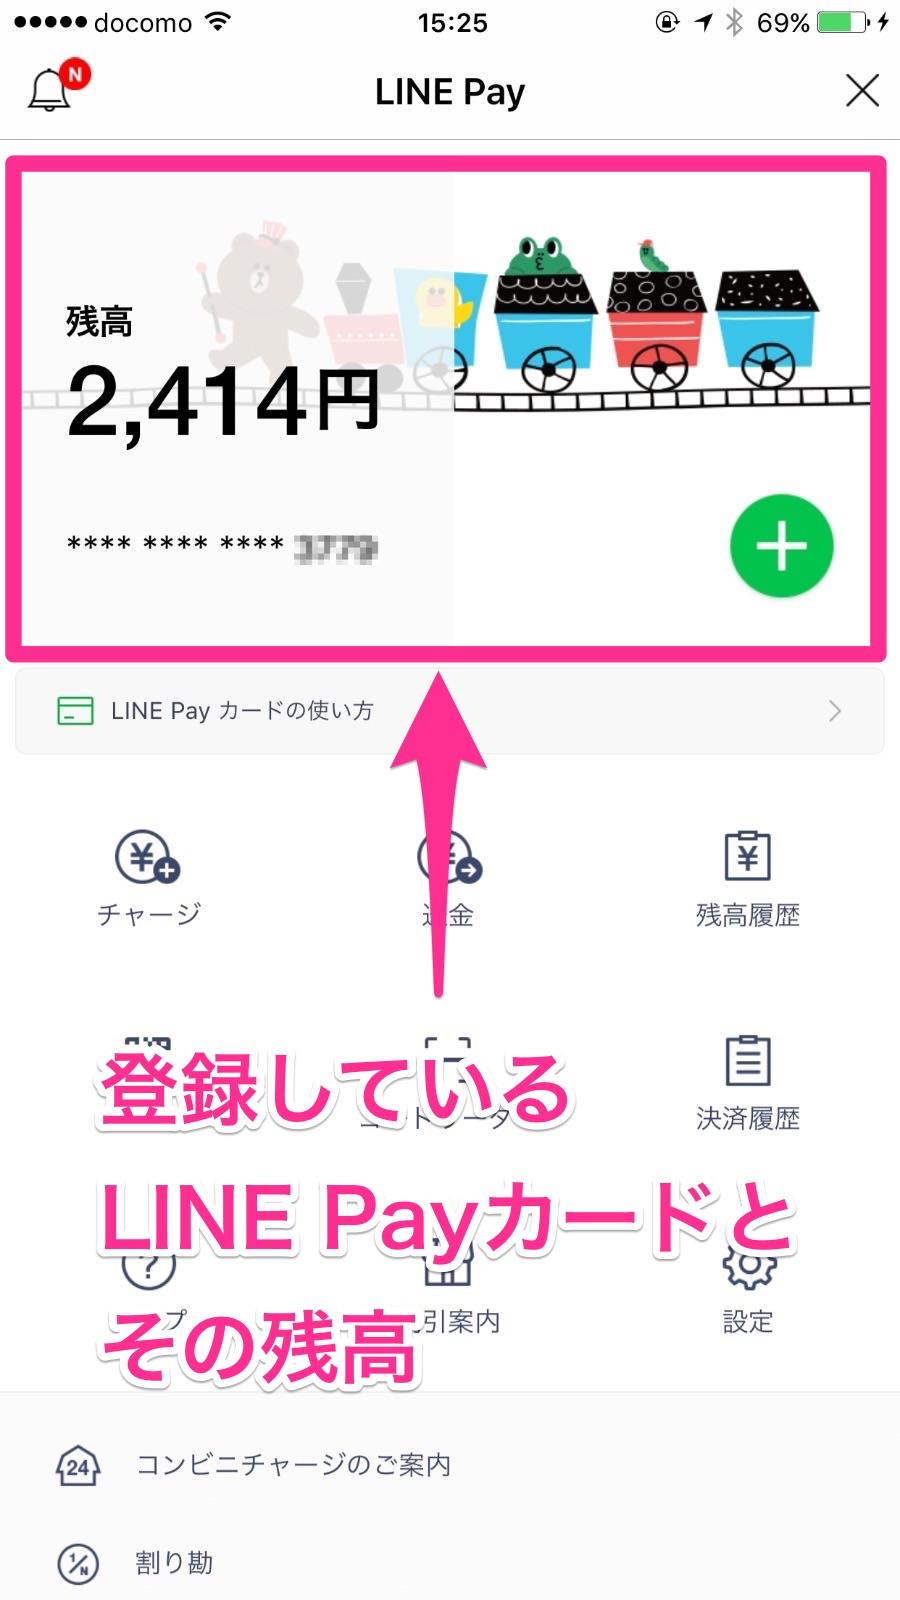 Line pay card 0331